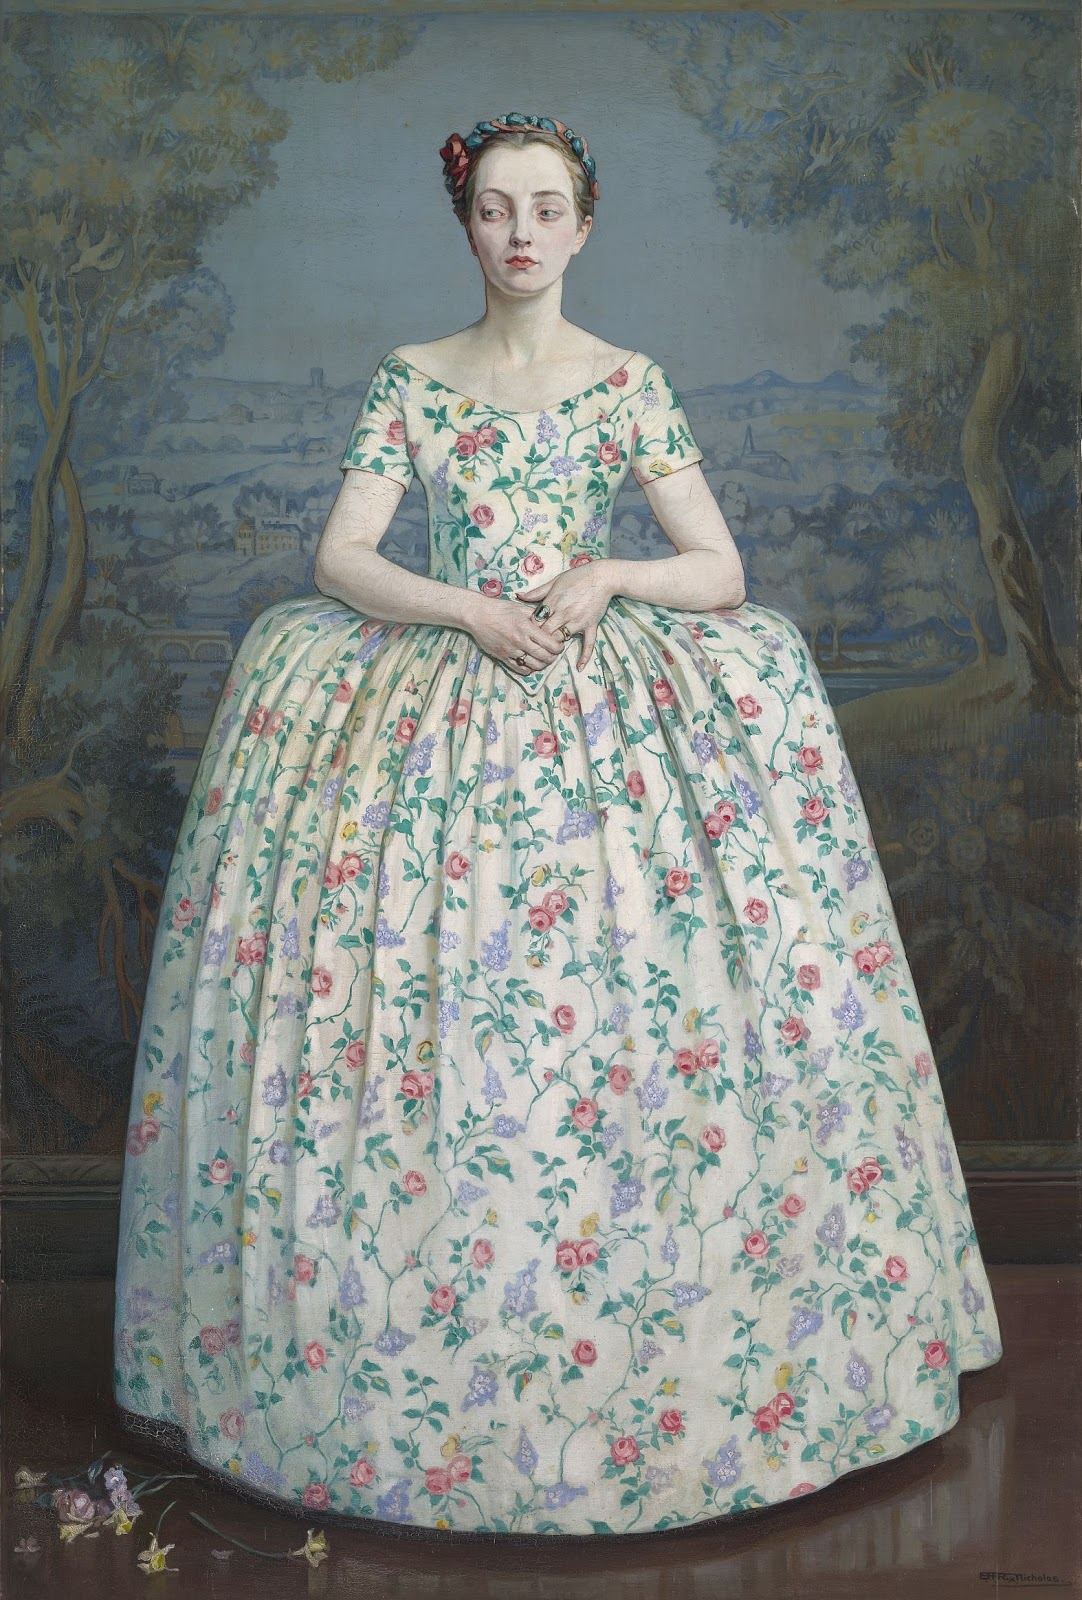 Hilda Rix Nicholas Les fleurs dedaignees National Gallery of Australia